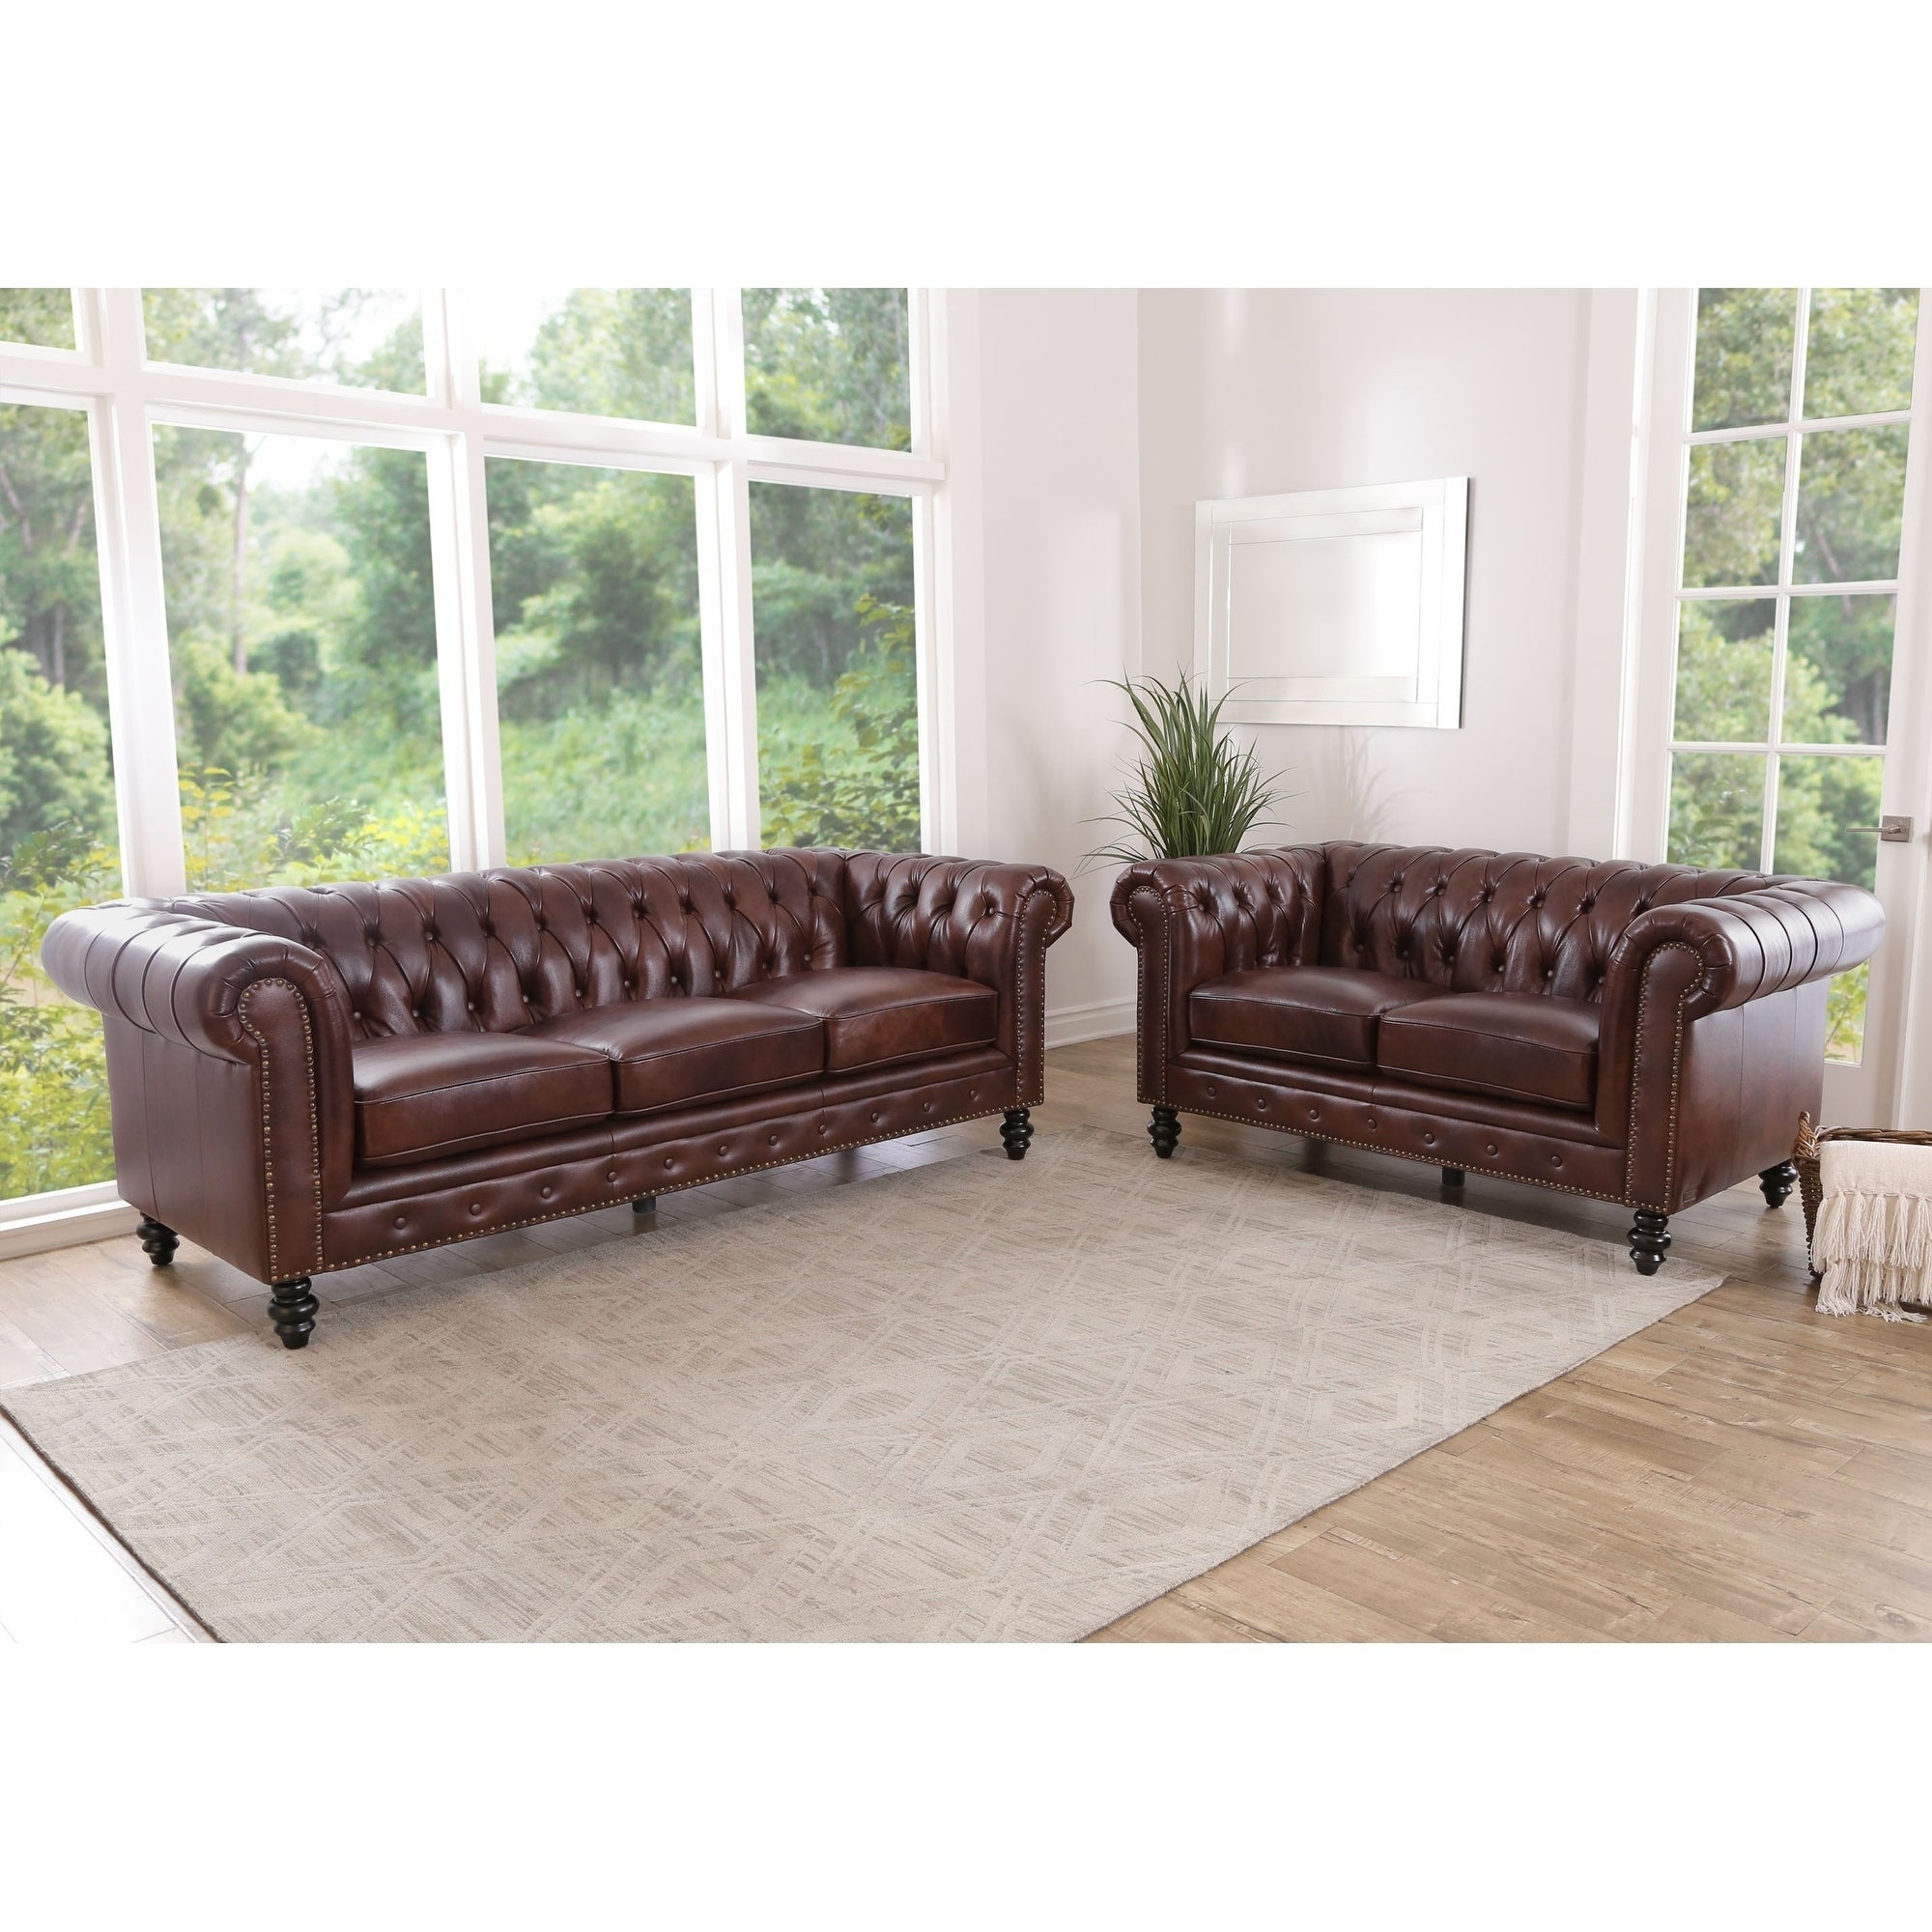 225 & Buy Living Room Furniture Sets Online at Overstock | Our Best Living ...